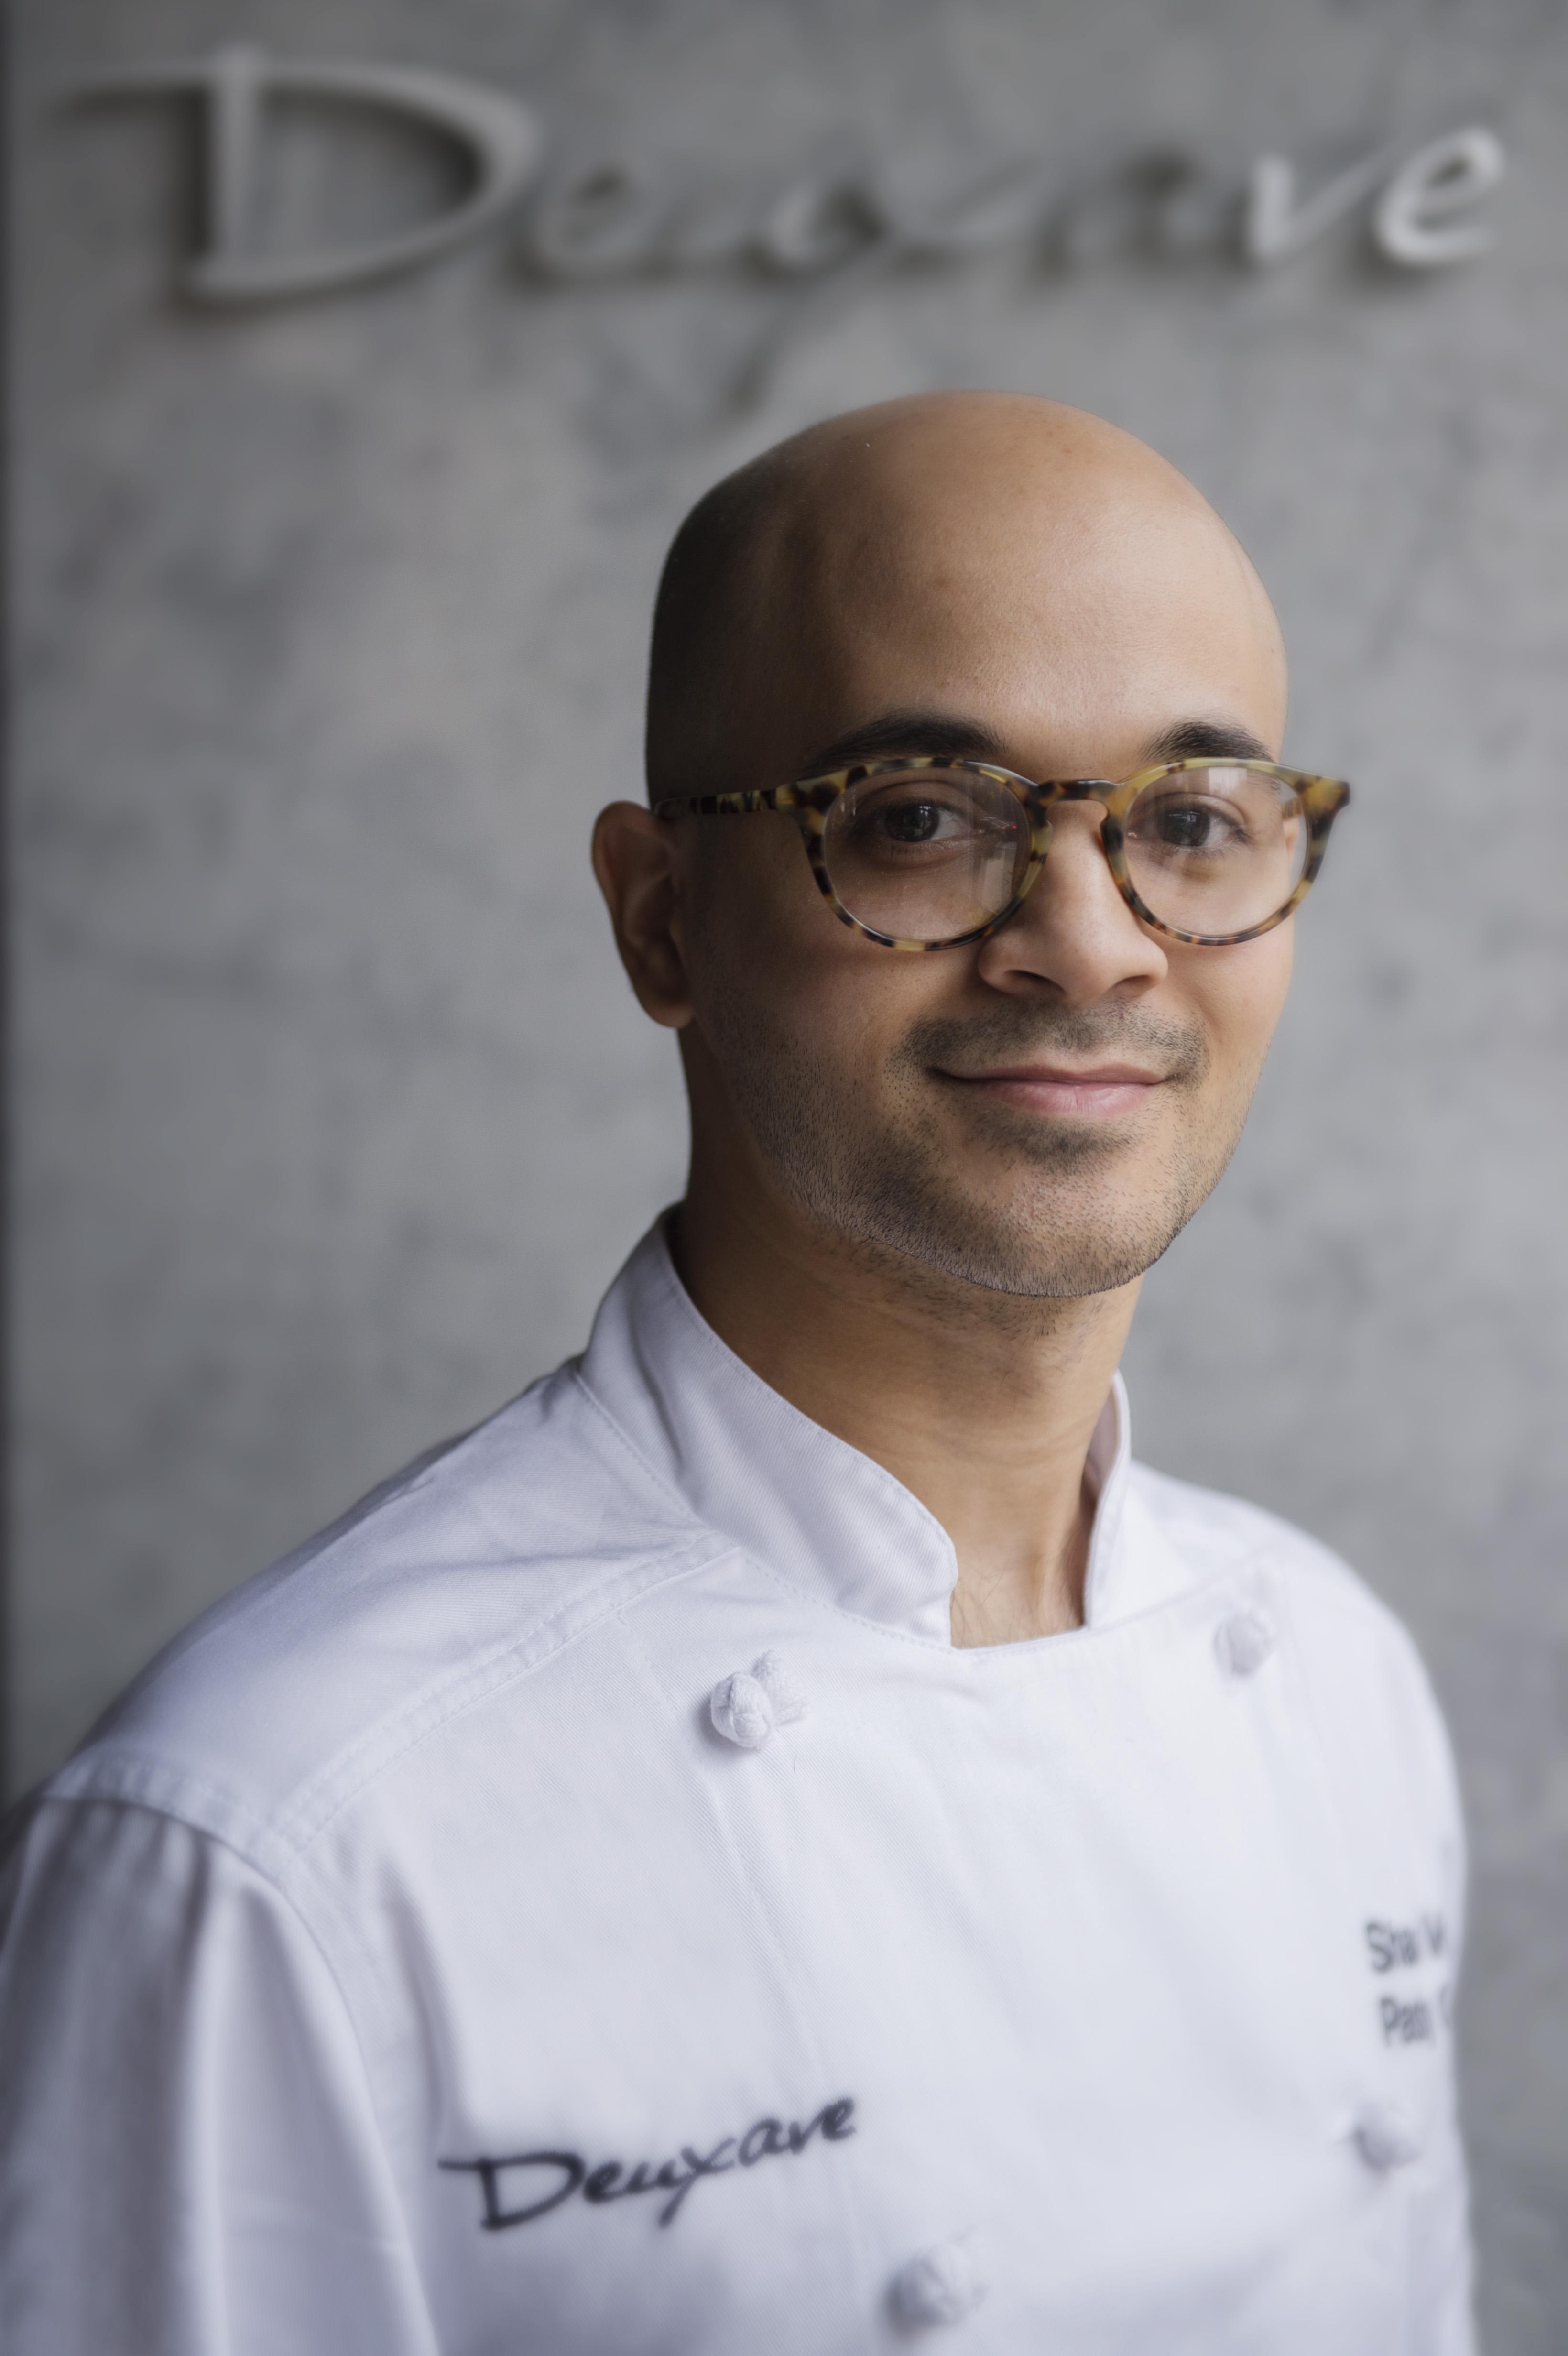 Shaun Velez, new pastry chef at Deuxave